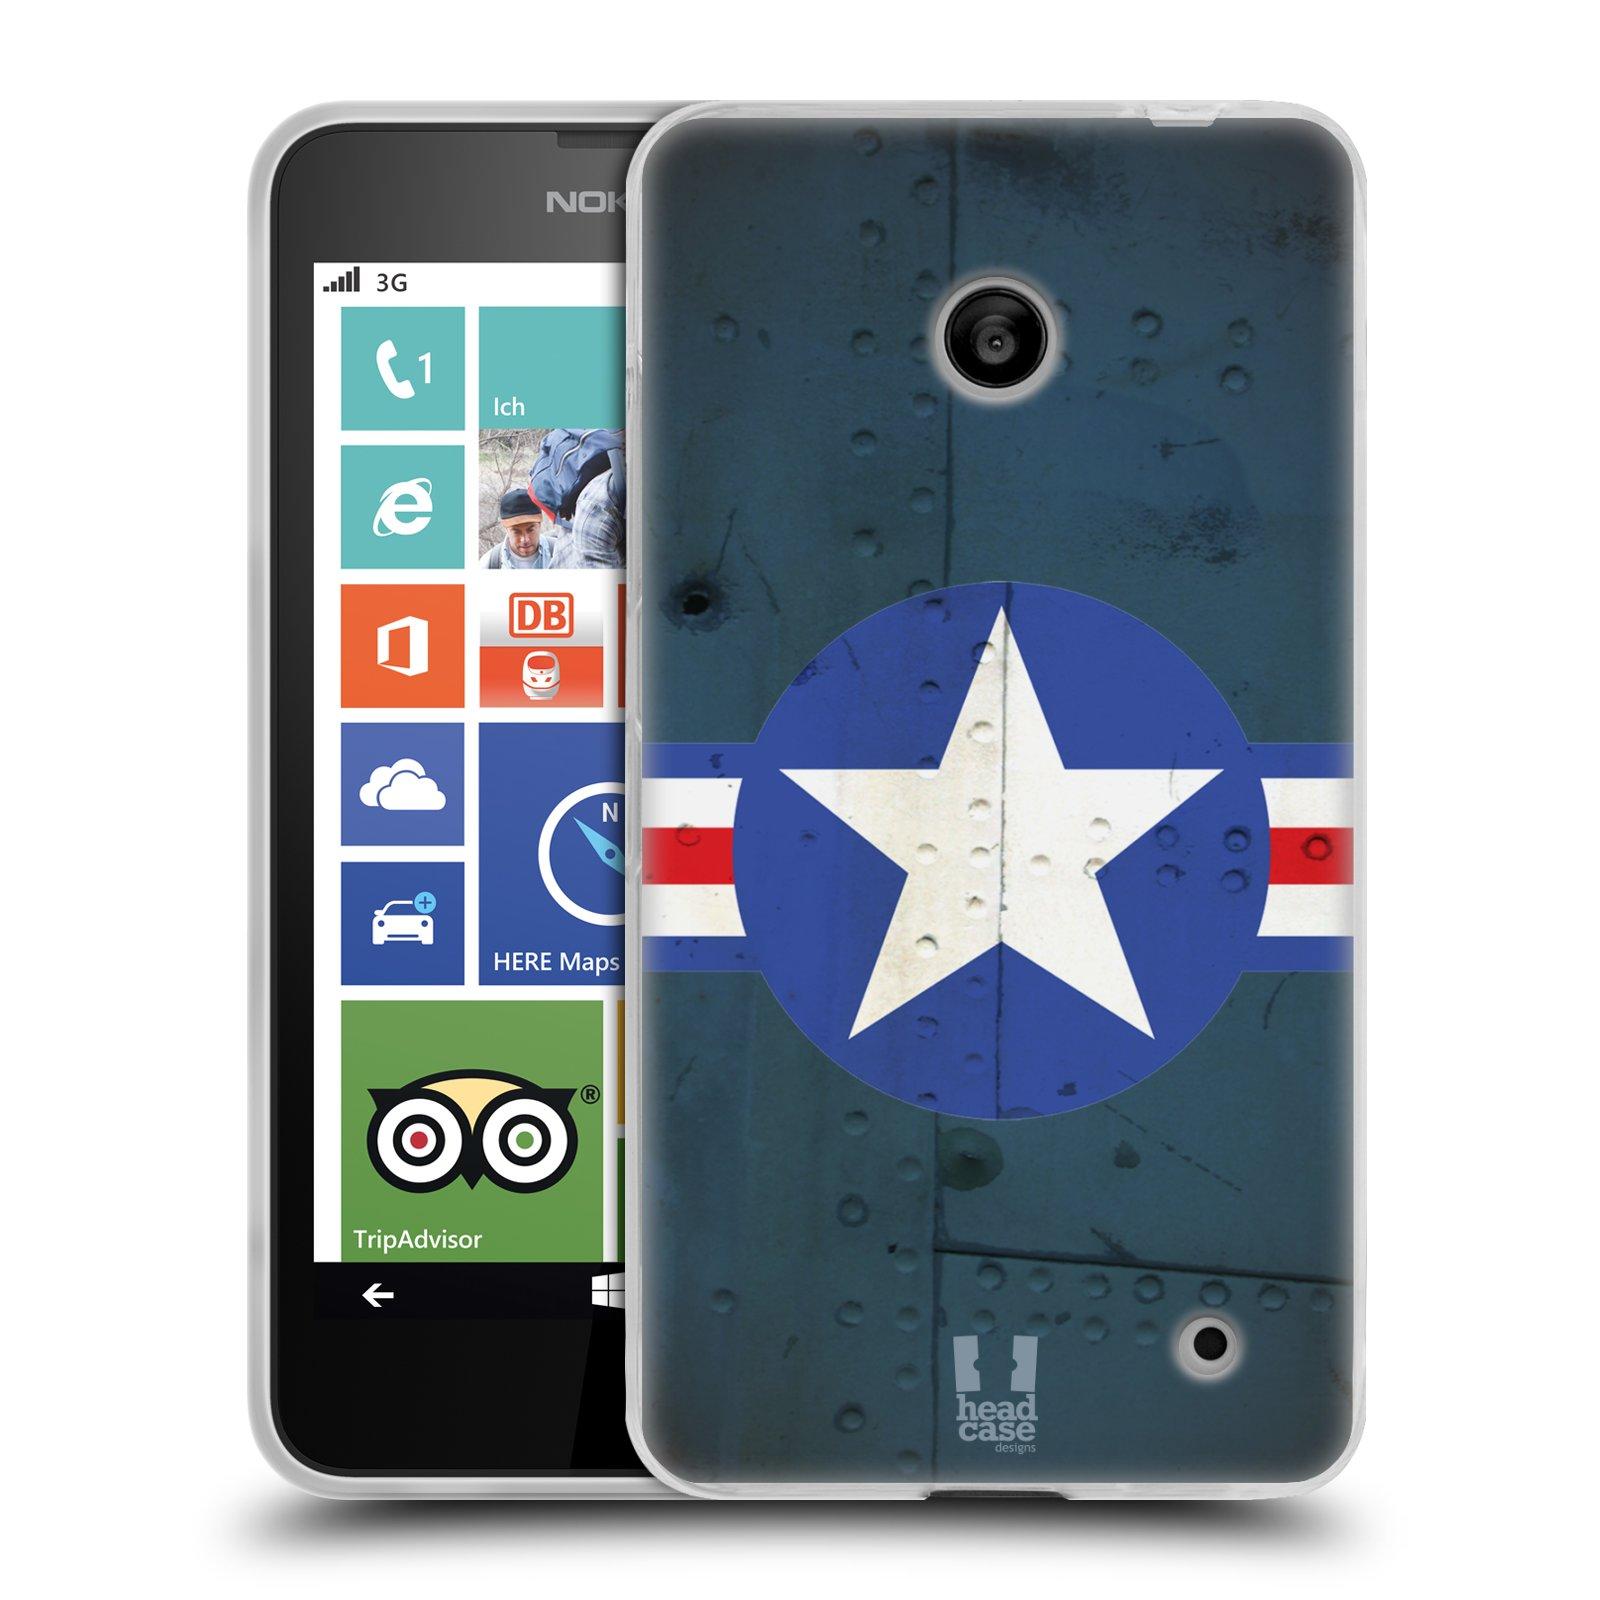 Silikonové pouzdro na mobil Nokia Lumia 630 HEAD CASE POSTWAR (Silikonový kryt či obal na mobilní telefon Nokia Lumia 630 a Nokia Lumia 630 Dual SIM)